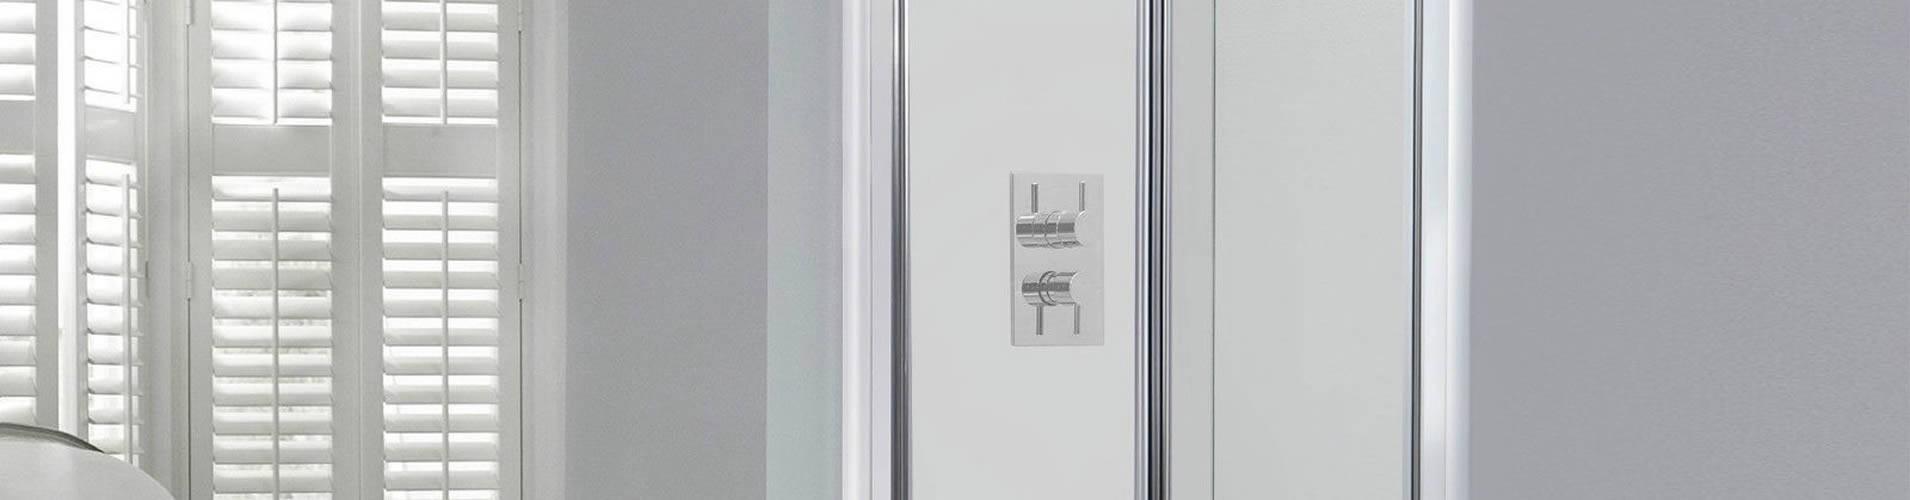 Alpharetta Marietta Roswell Buckhead shower doors  Atlanta Framed Shower  Doors Superior Shower Doors Georgia. Roswell Shower Doors